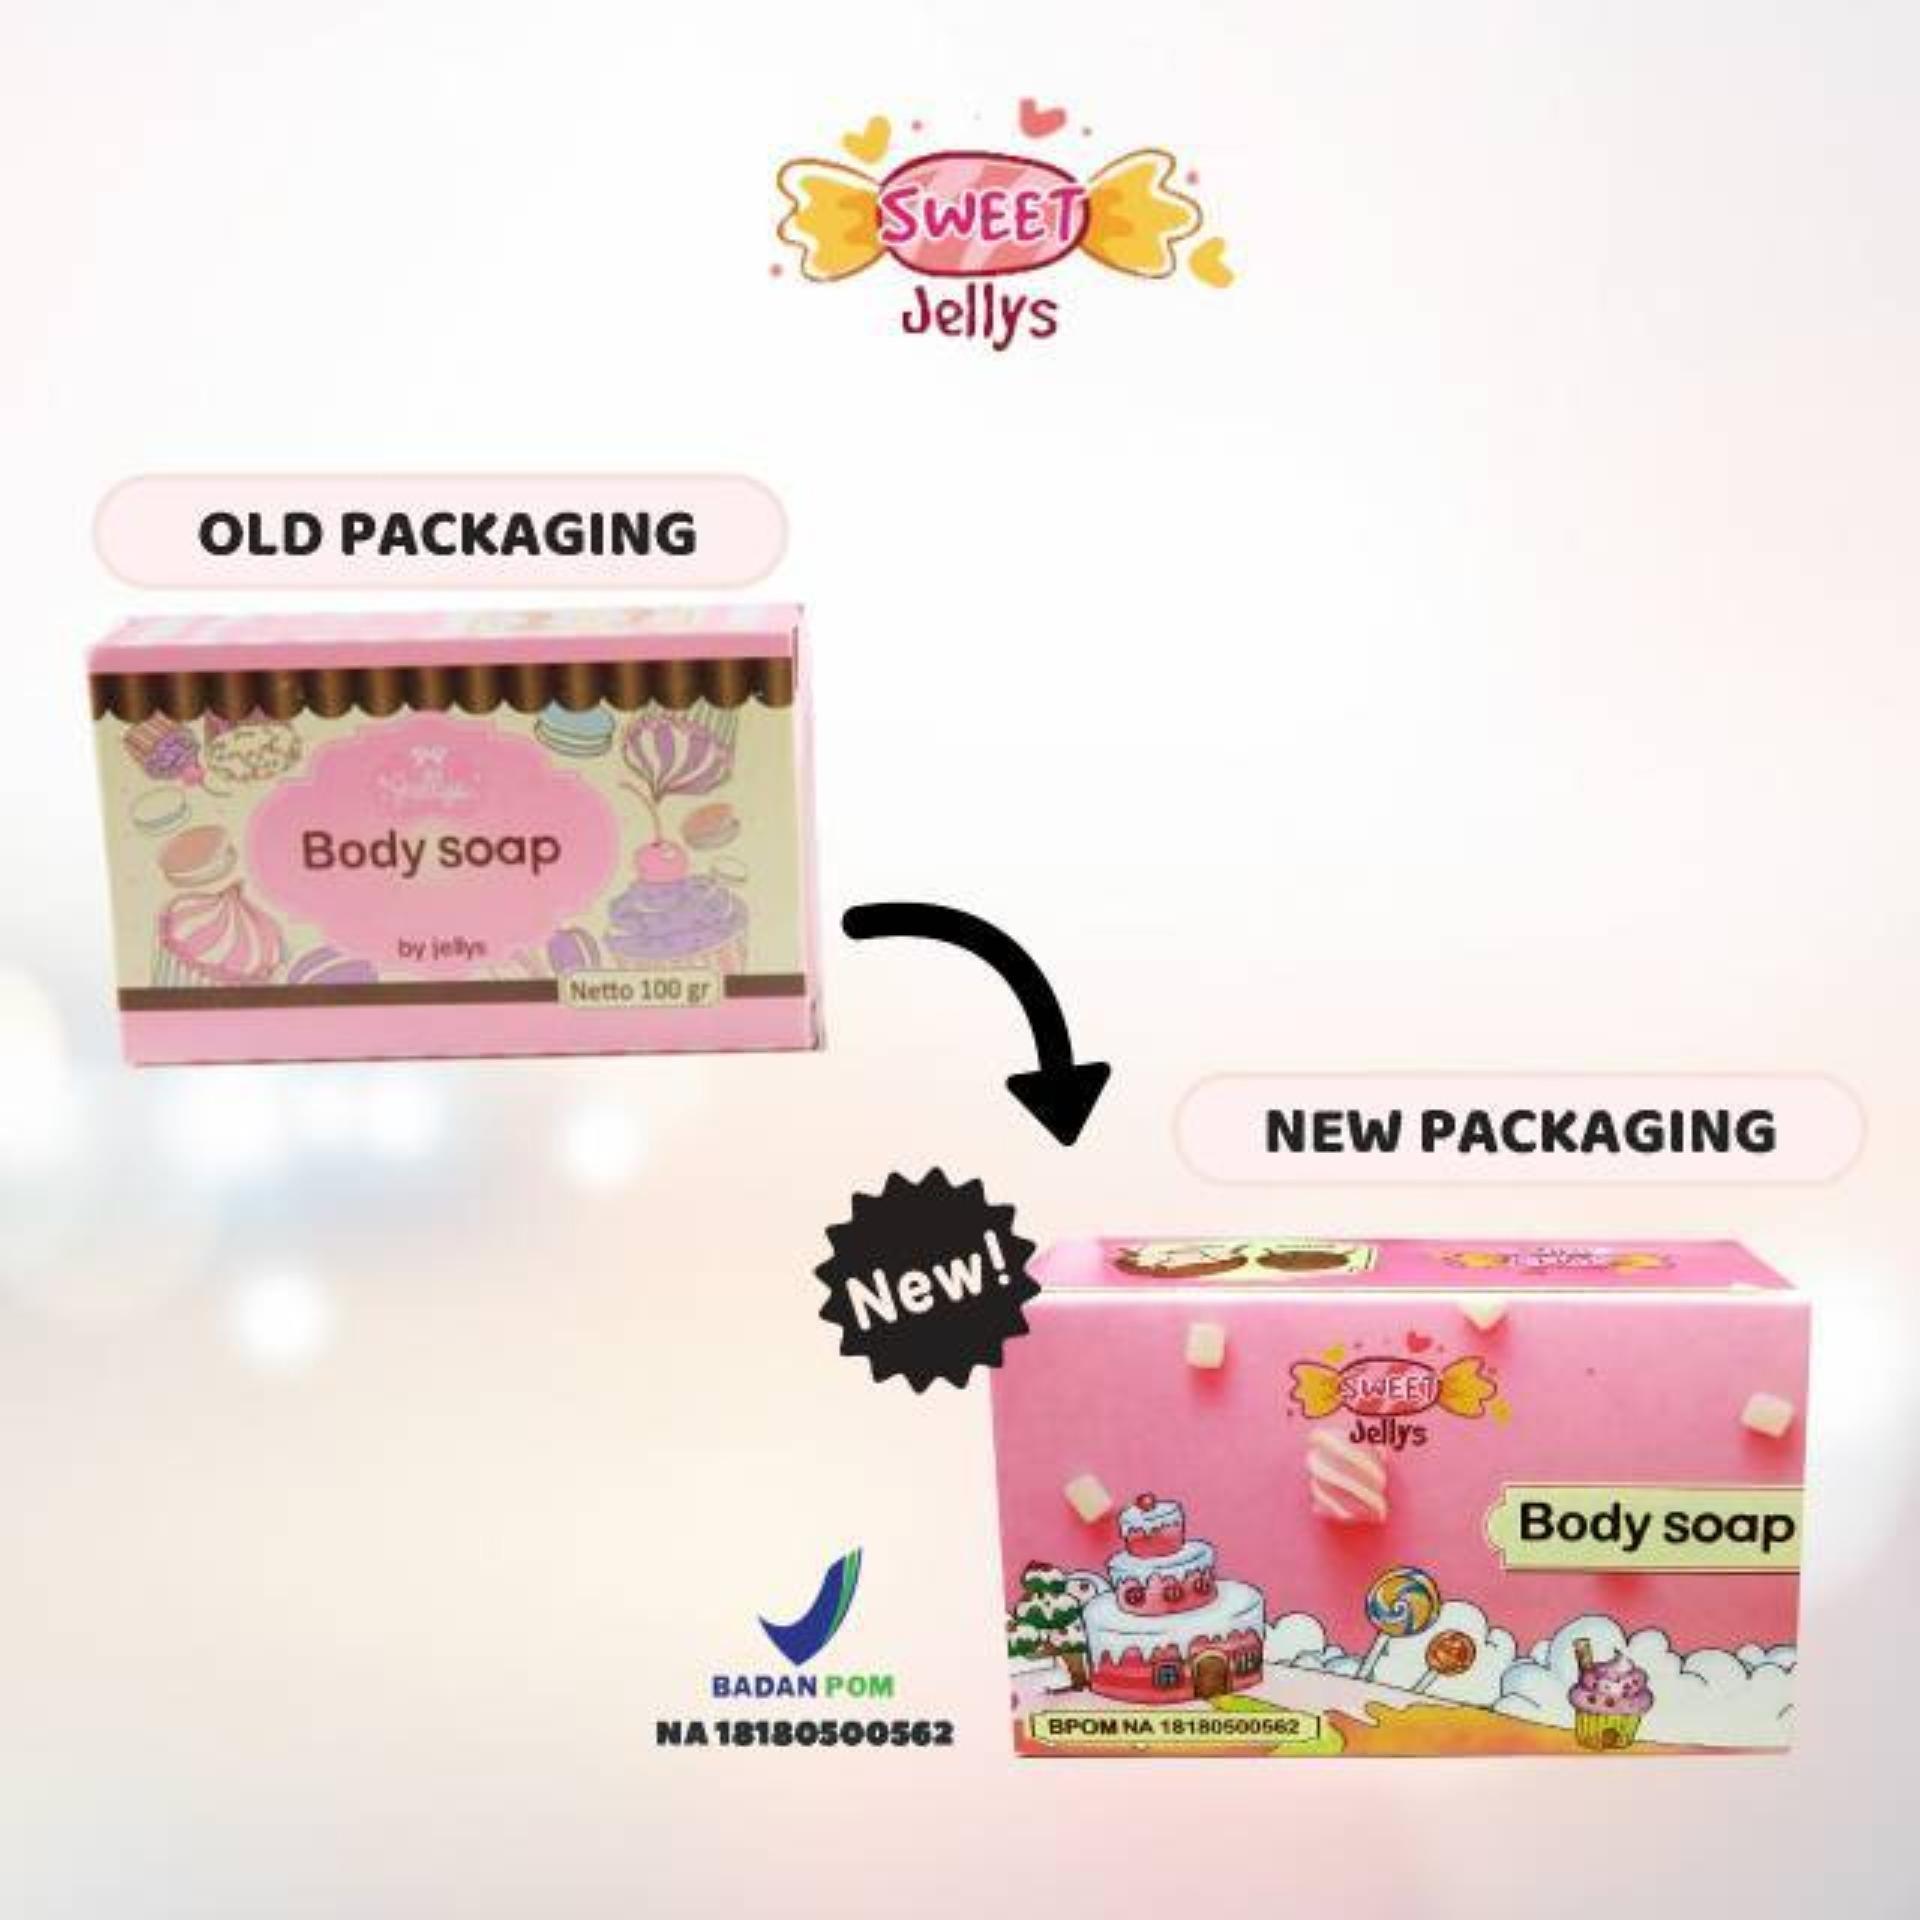 Pure Body Soap by Jellys BPOM Sabun Pemutih Badan - Sweet Jelly - 100 gr - BPOM ORIGINAL- 100 gram - 1pc | Lazada Indonesia